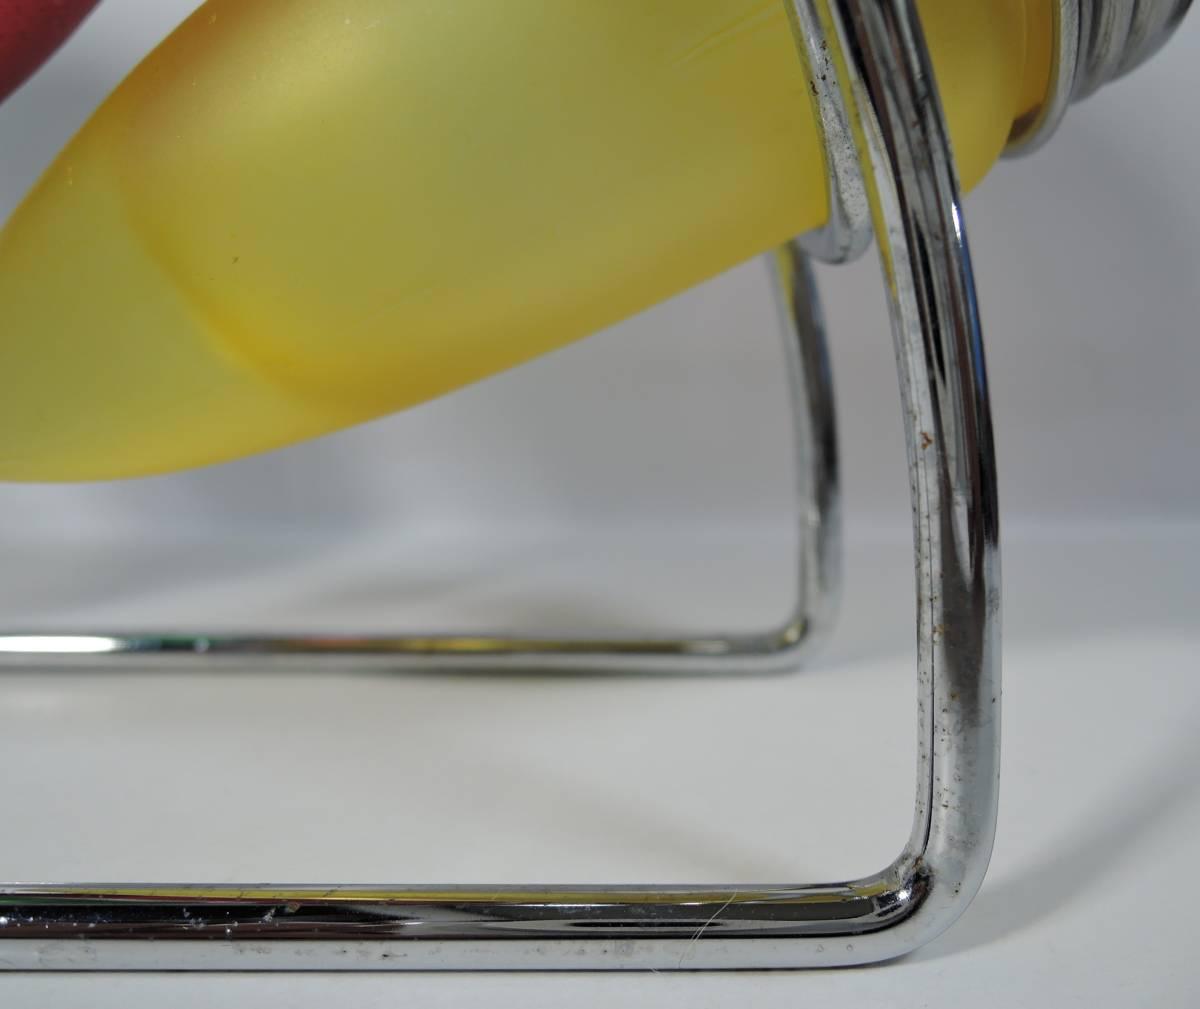 Y03■昭和レトロ カラフルガラス瓶 調味料入 ラック付■_画像10